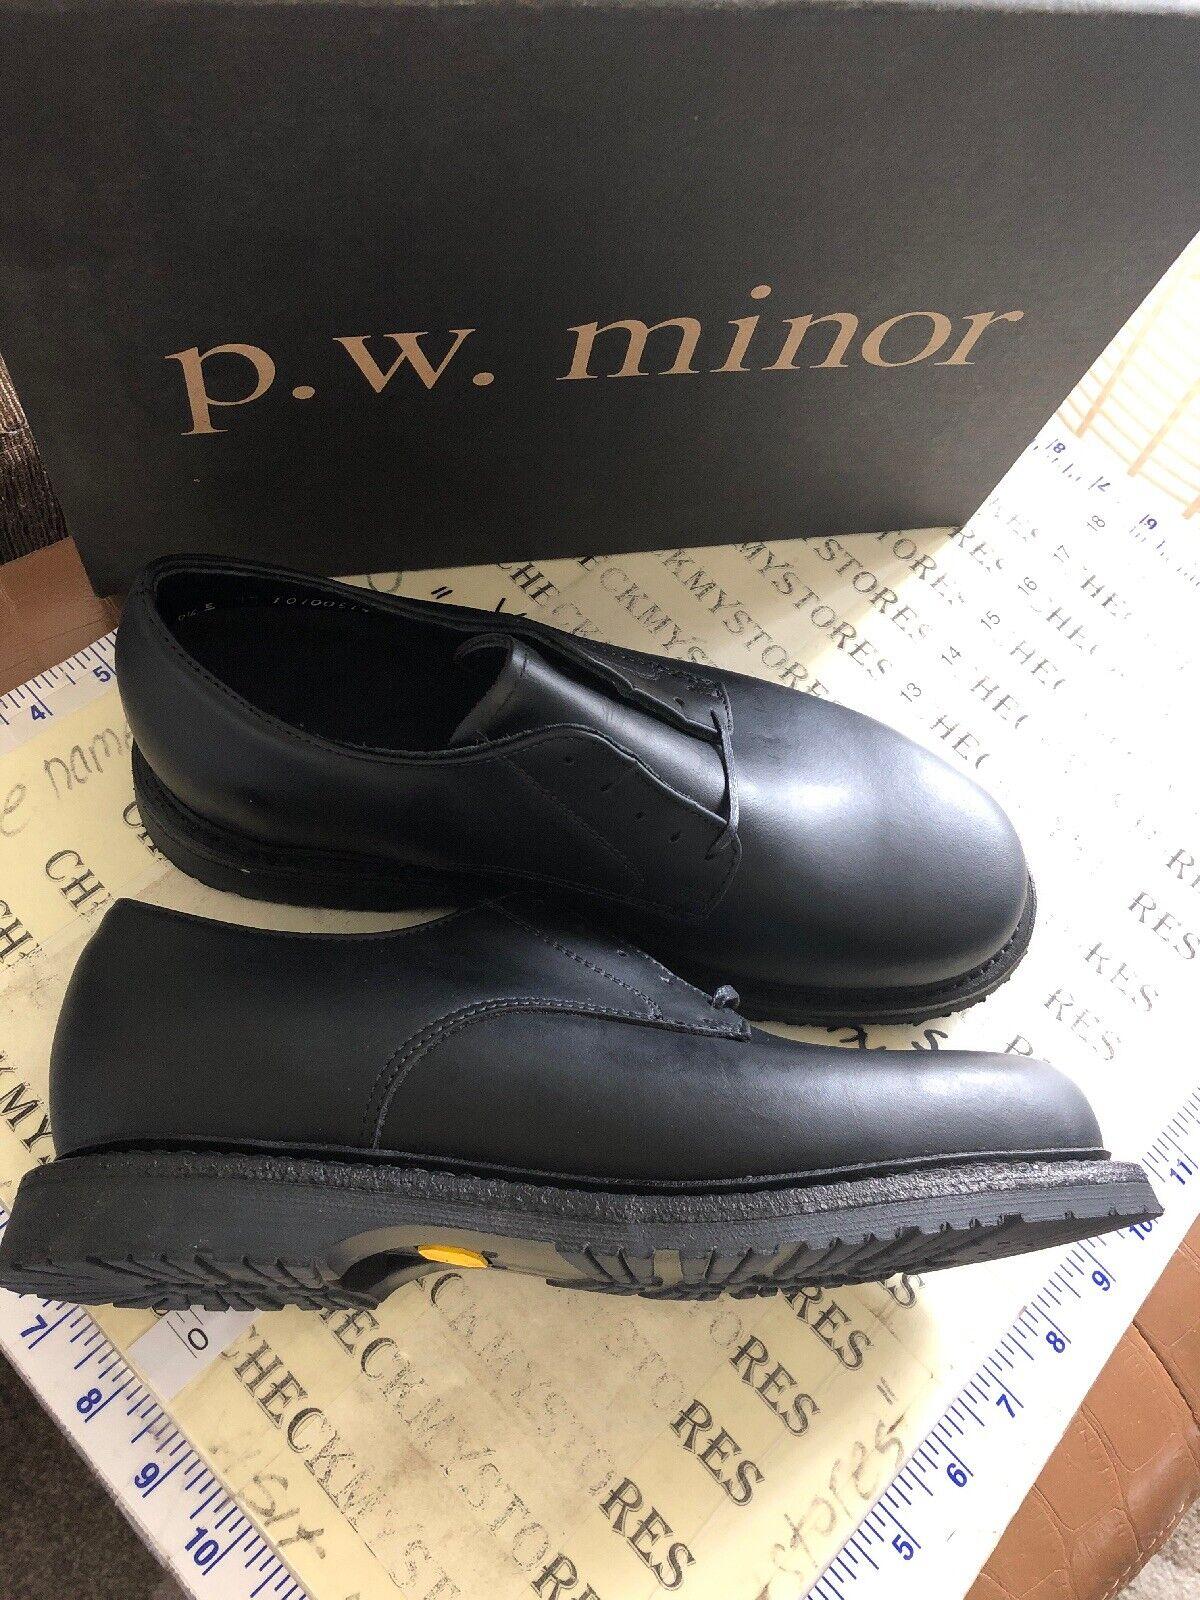 Nouveau P.W. Minor Rochester en Cuir Premium chaussures VIBRAM Sole Made in USA a choisi SZ